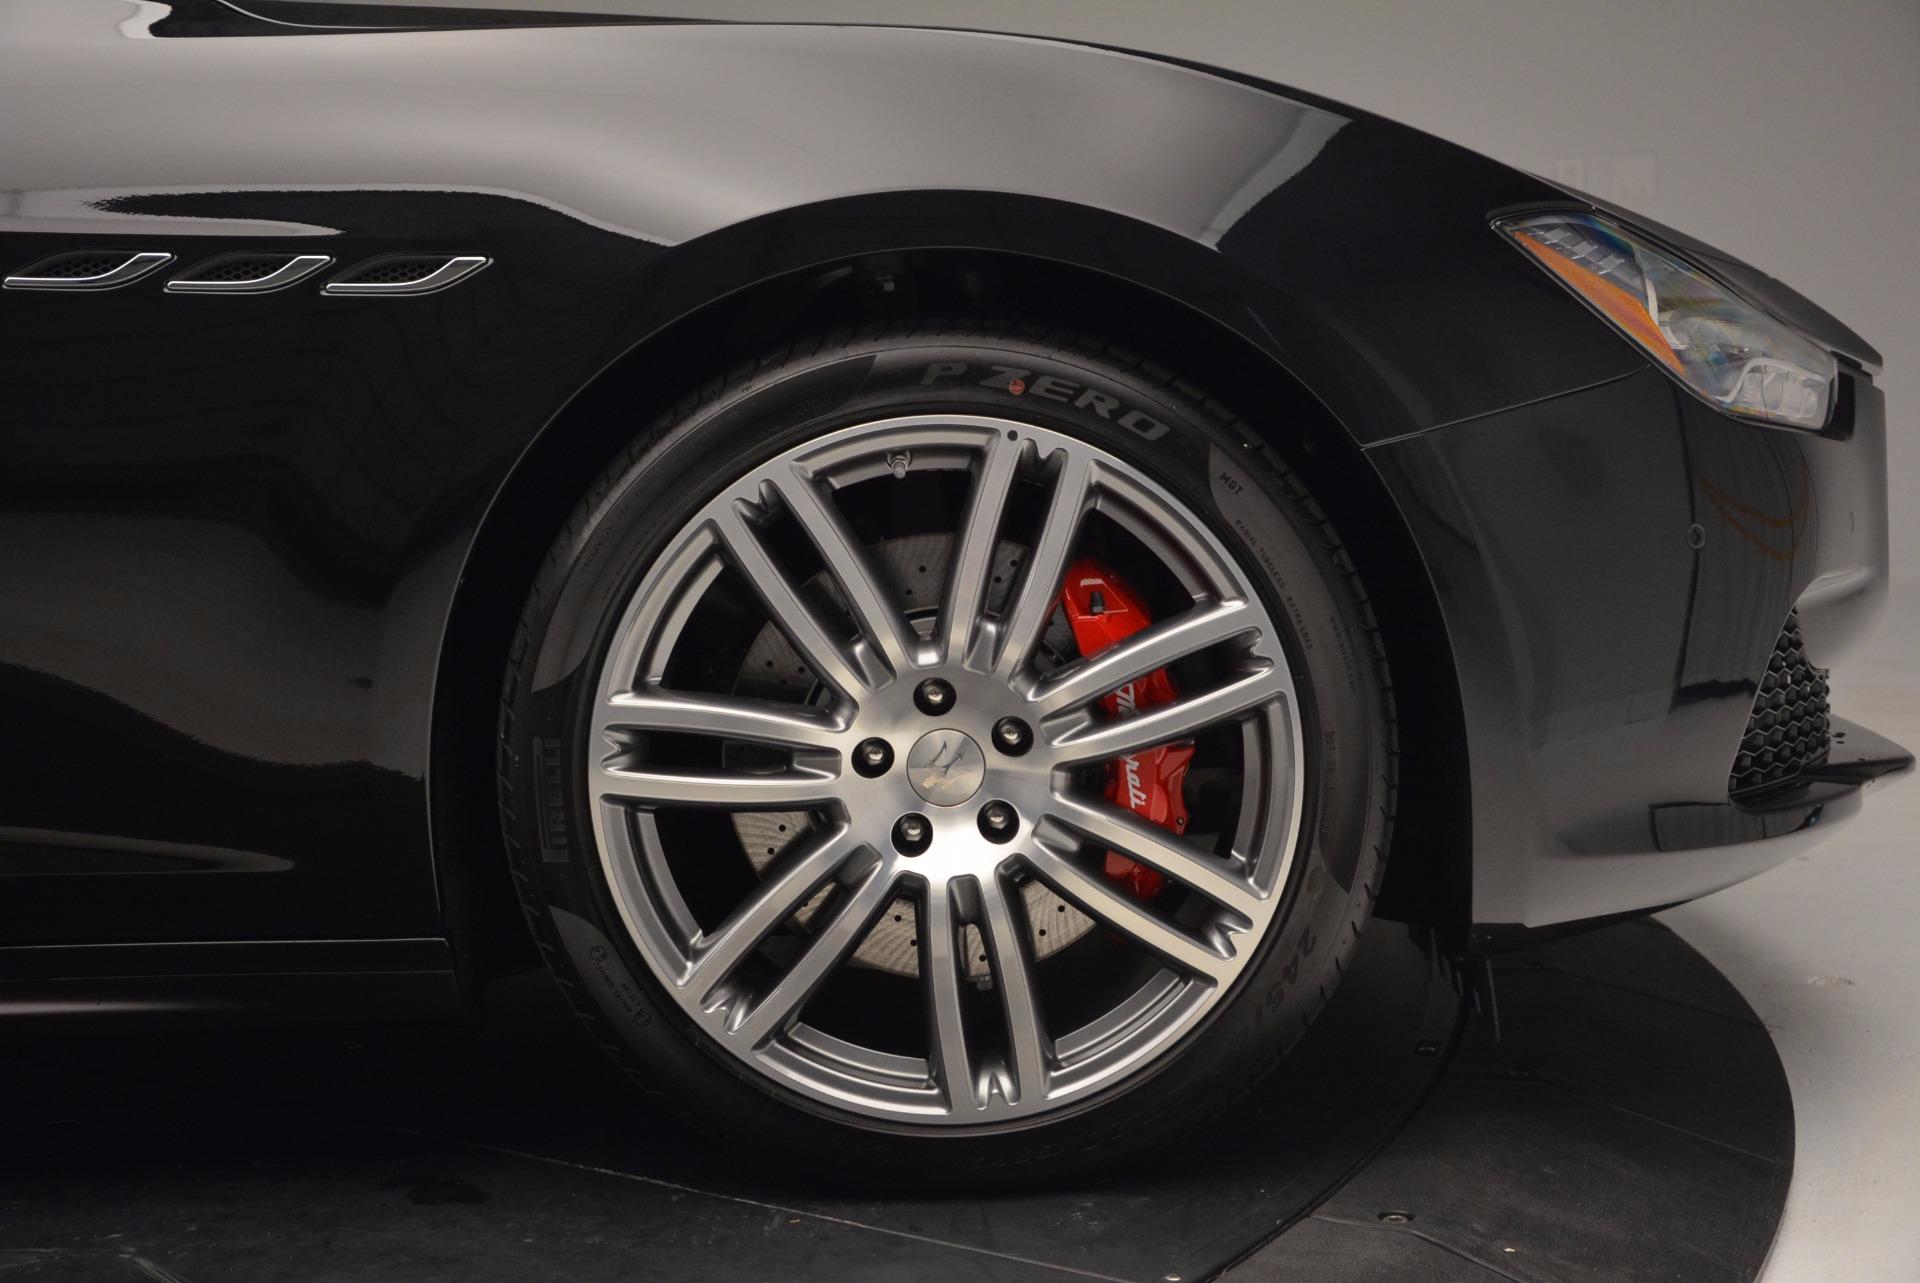 Used 2014 Maserati Ghibli S Q4 For Sale In Greenwich, CT. Alfa Romeo of Greenwich, 7249 1459_p13